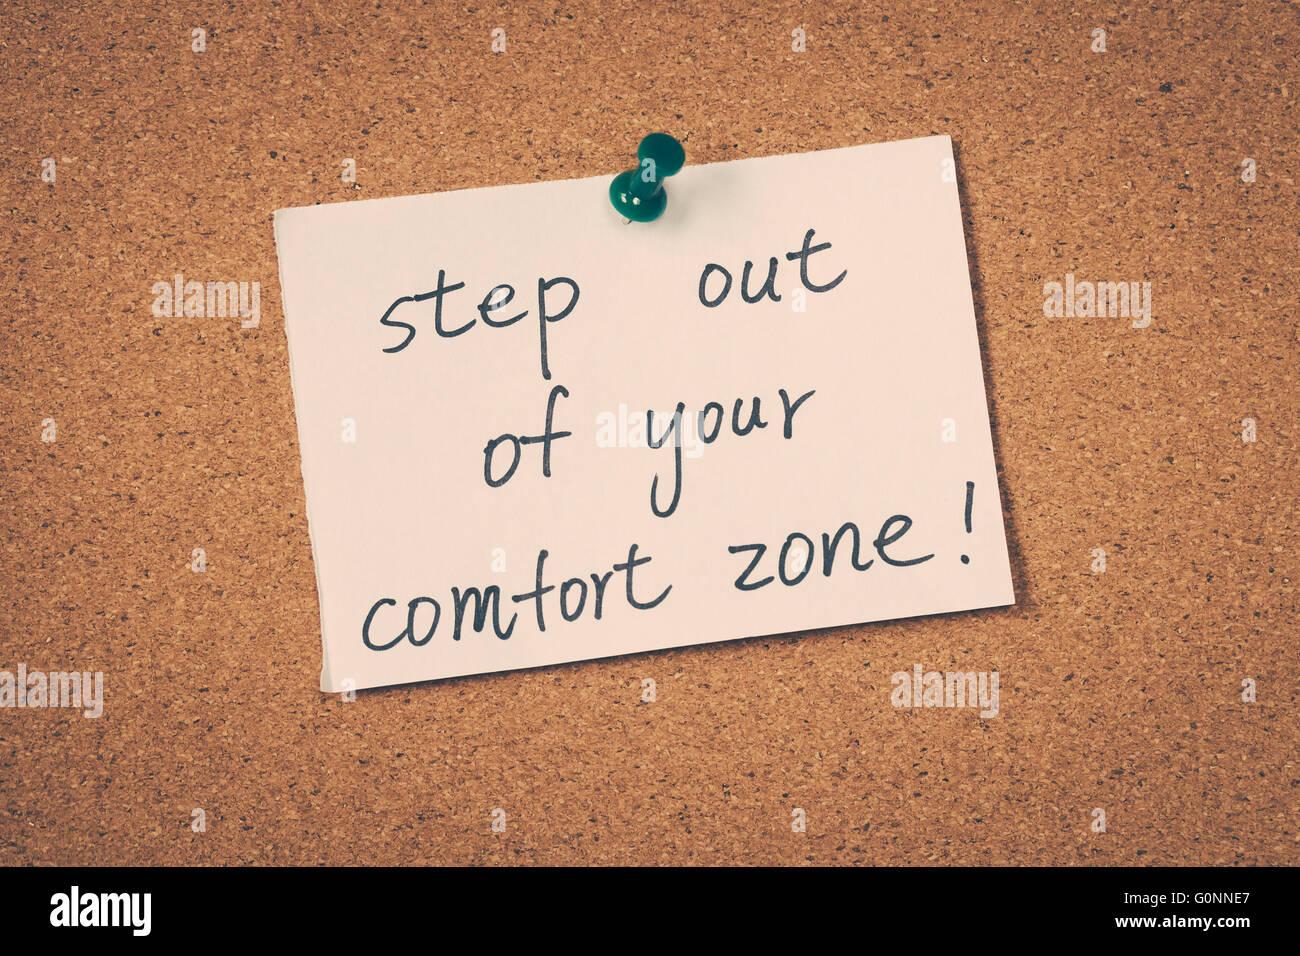 comfort zone Stock Photo